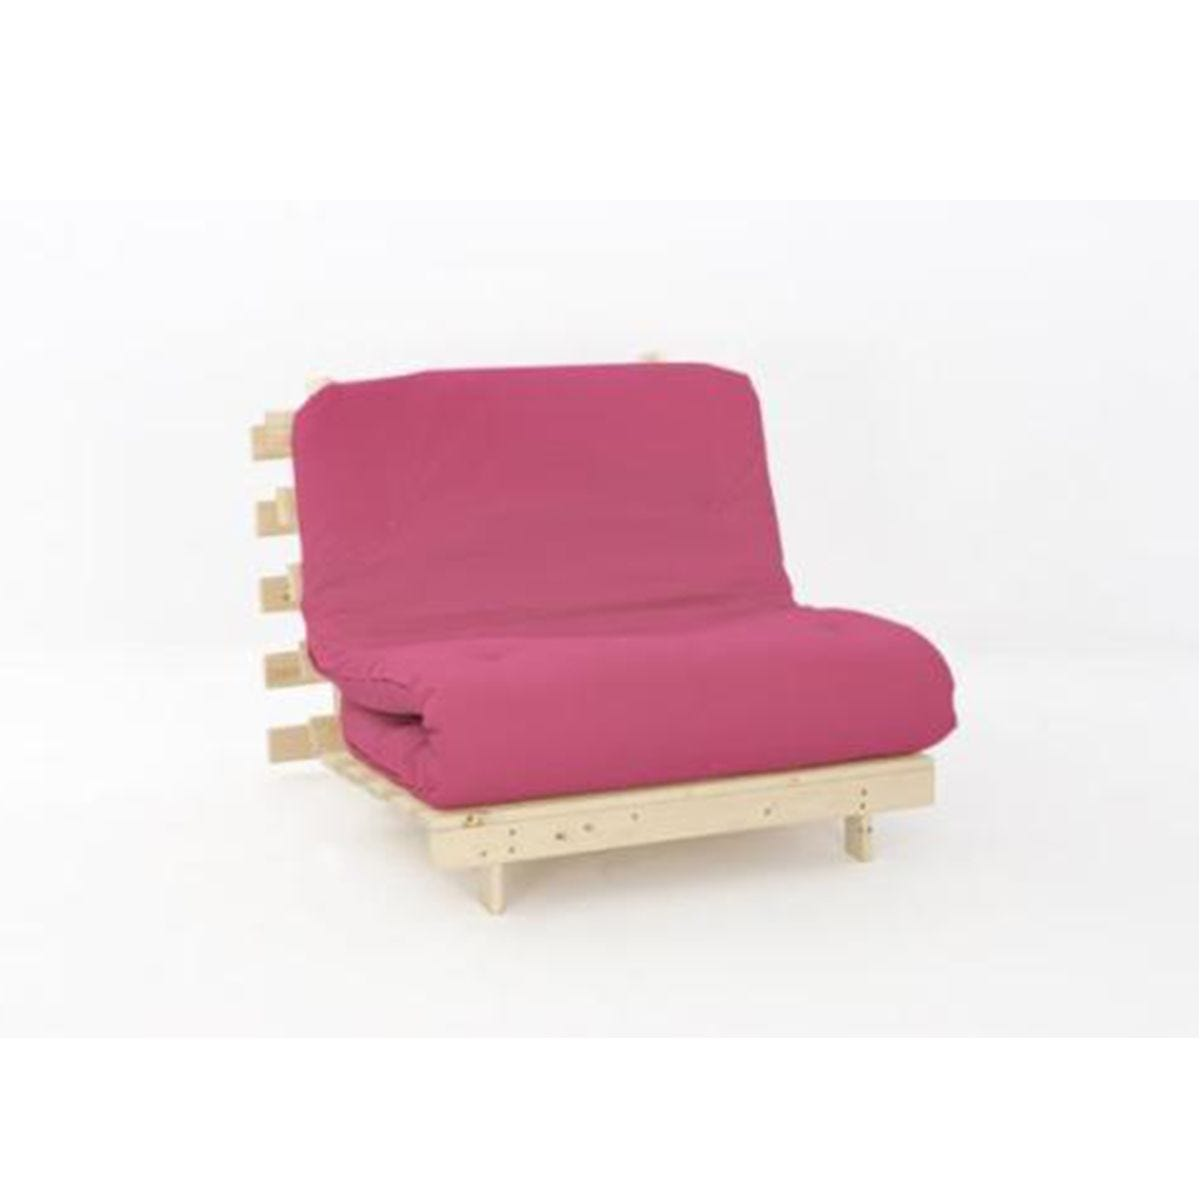 Ayr Futon Single Set With Tufted Mattress - Pink